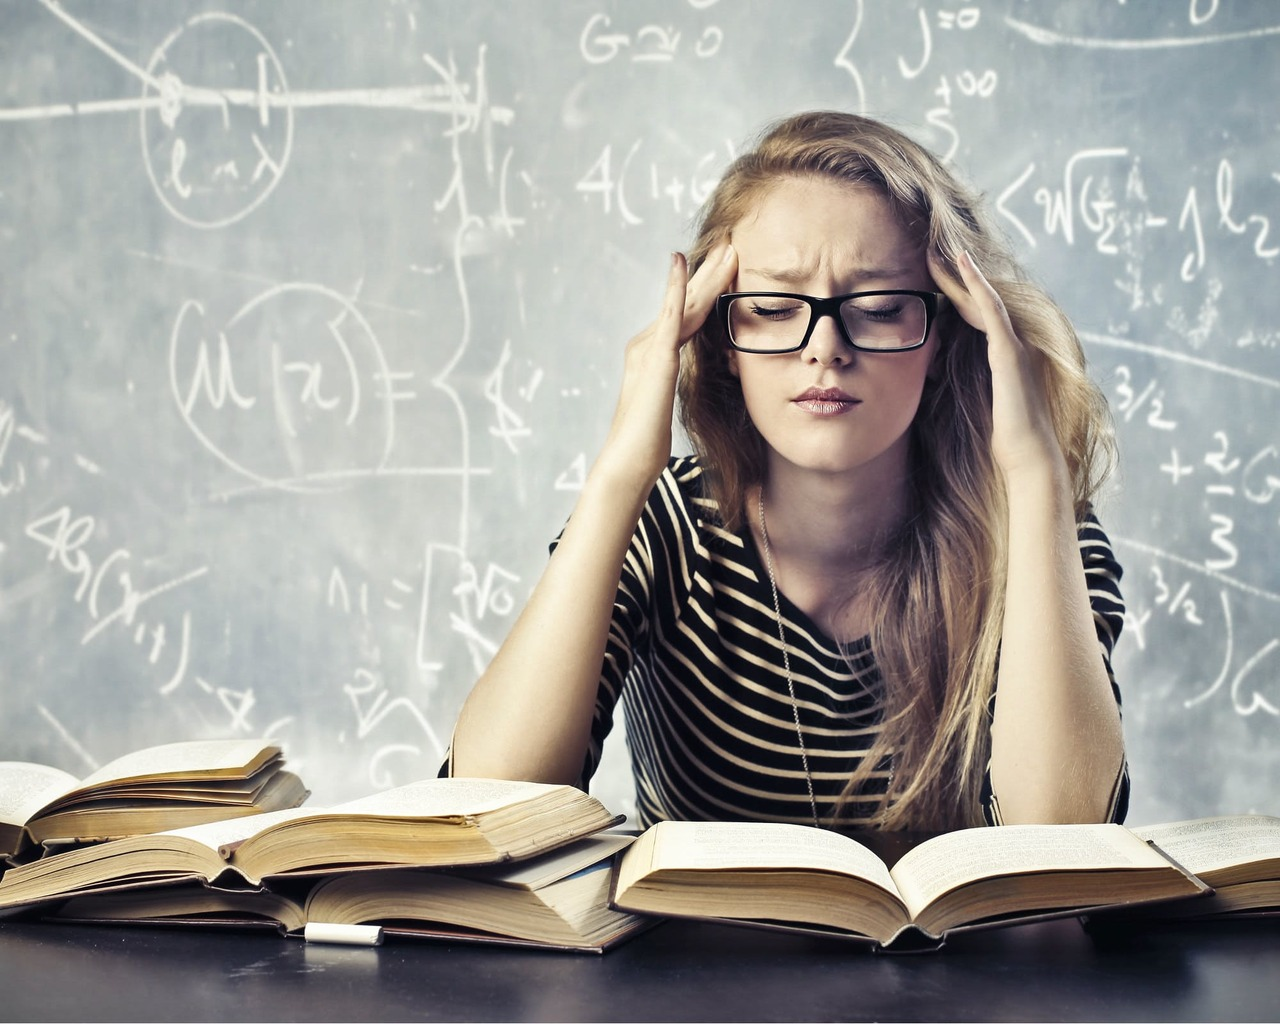 student-study-stress-img.jpg